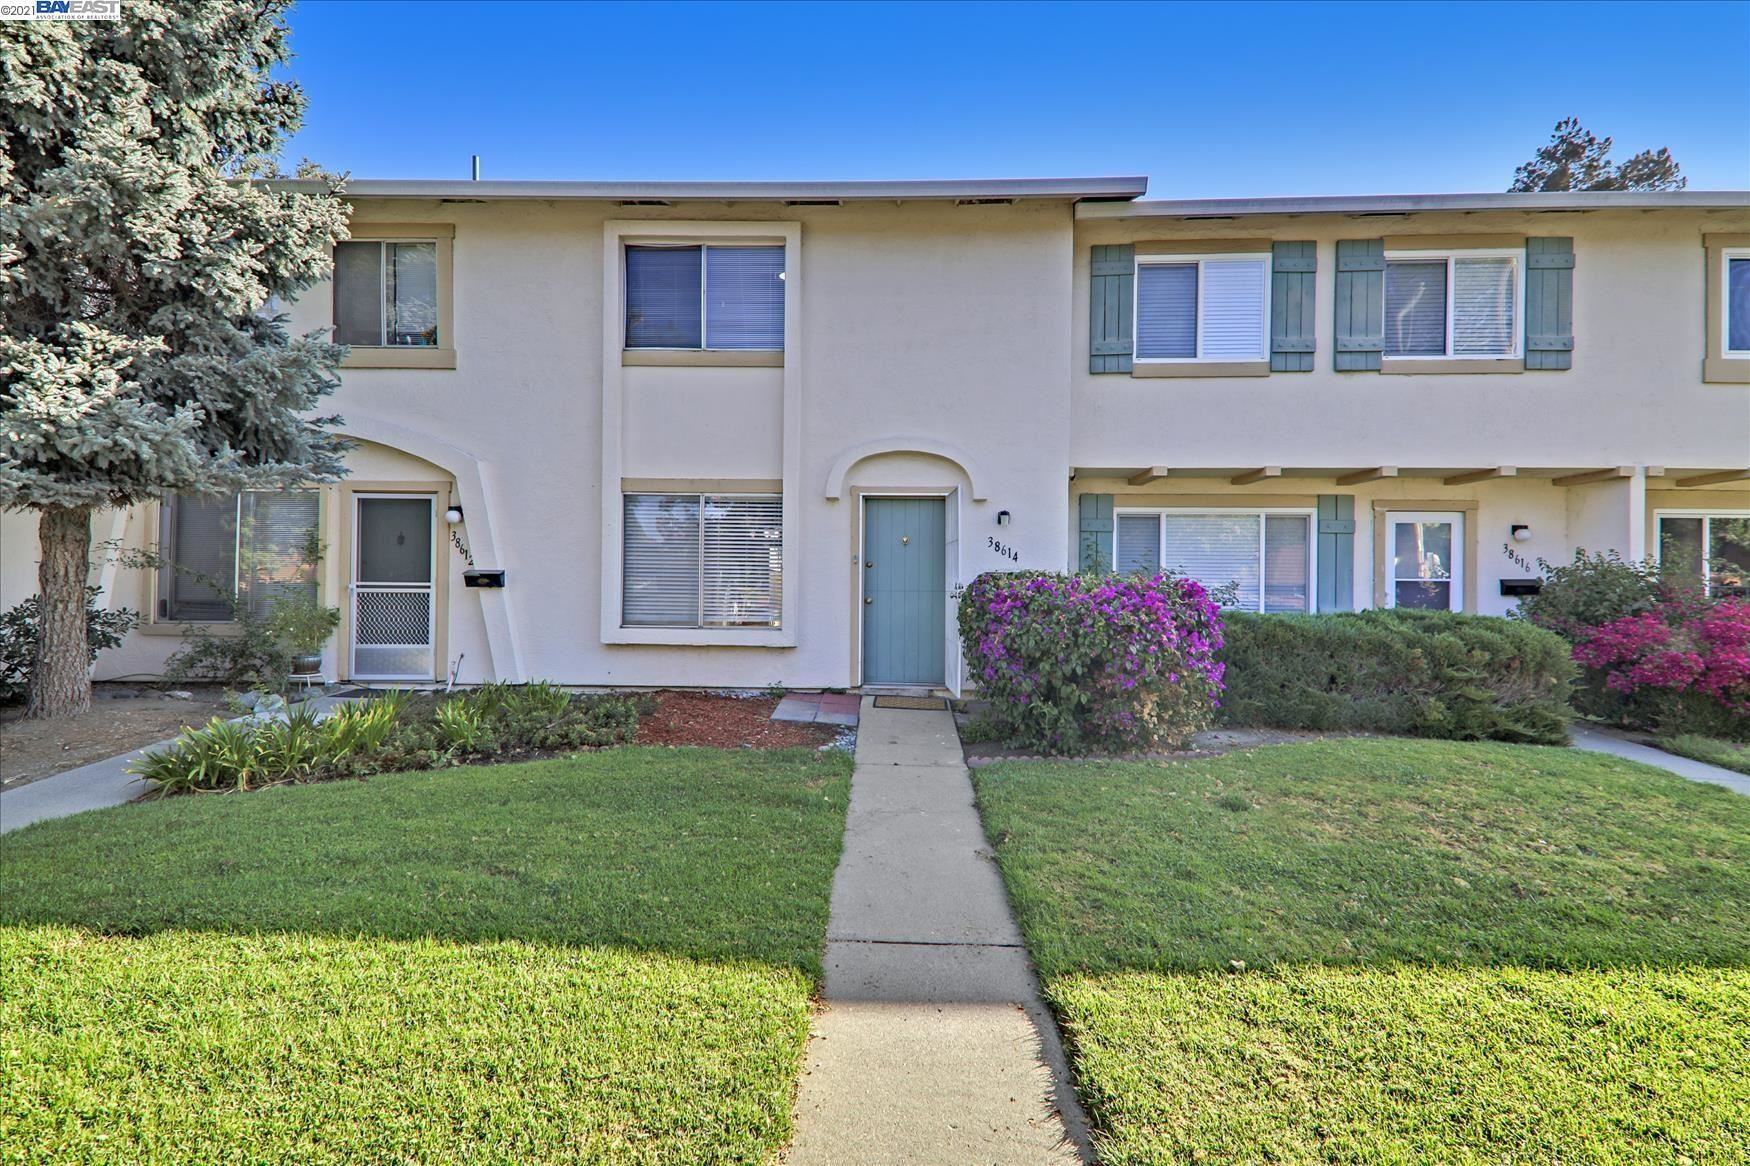 38614 Royal Ann Cmn, Fremont, CA 94536 - MLS#: 40967107